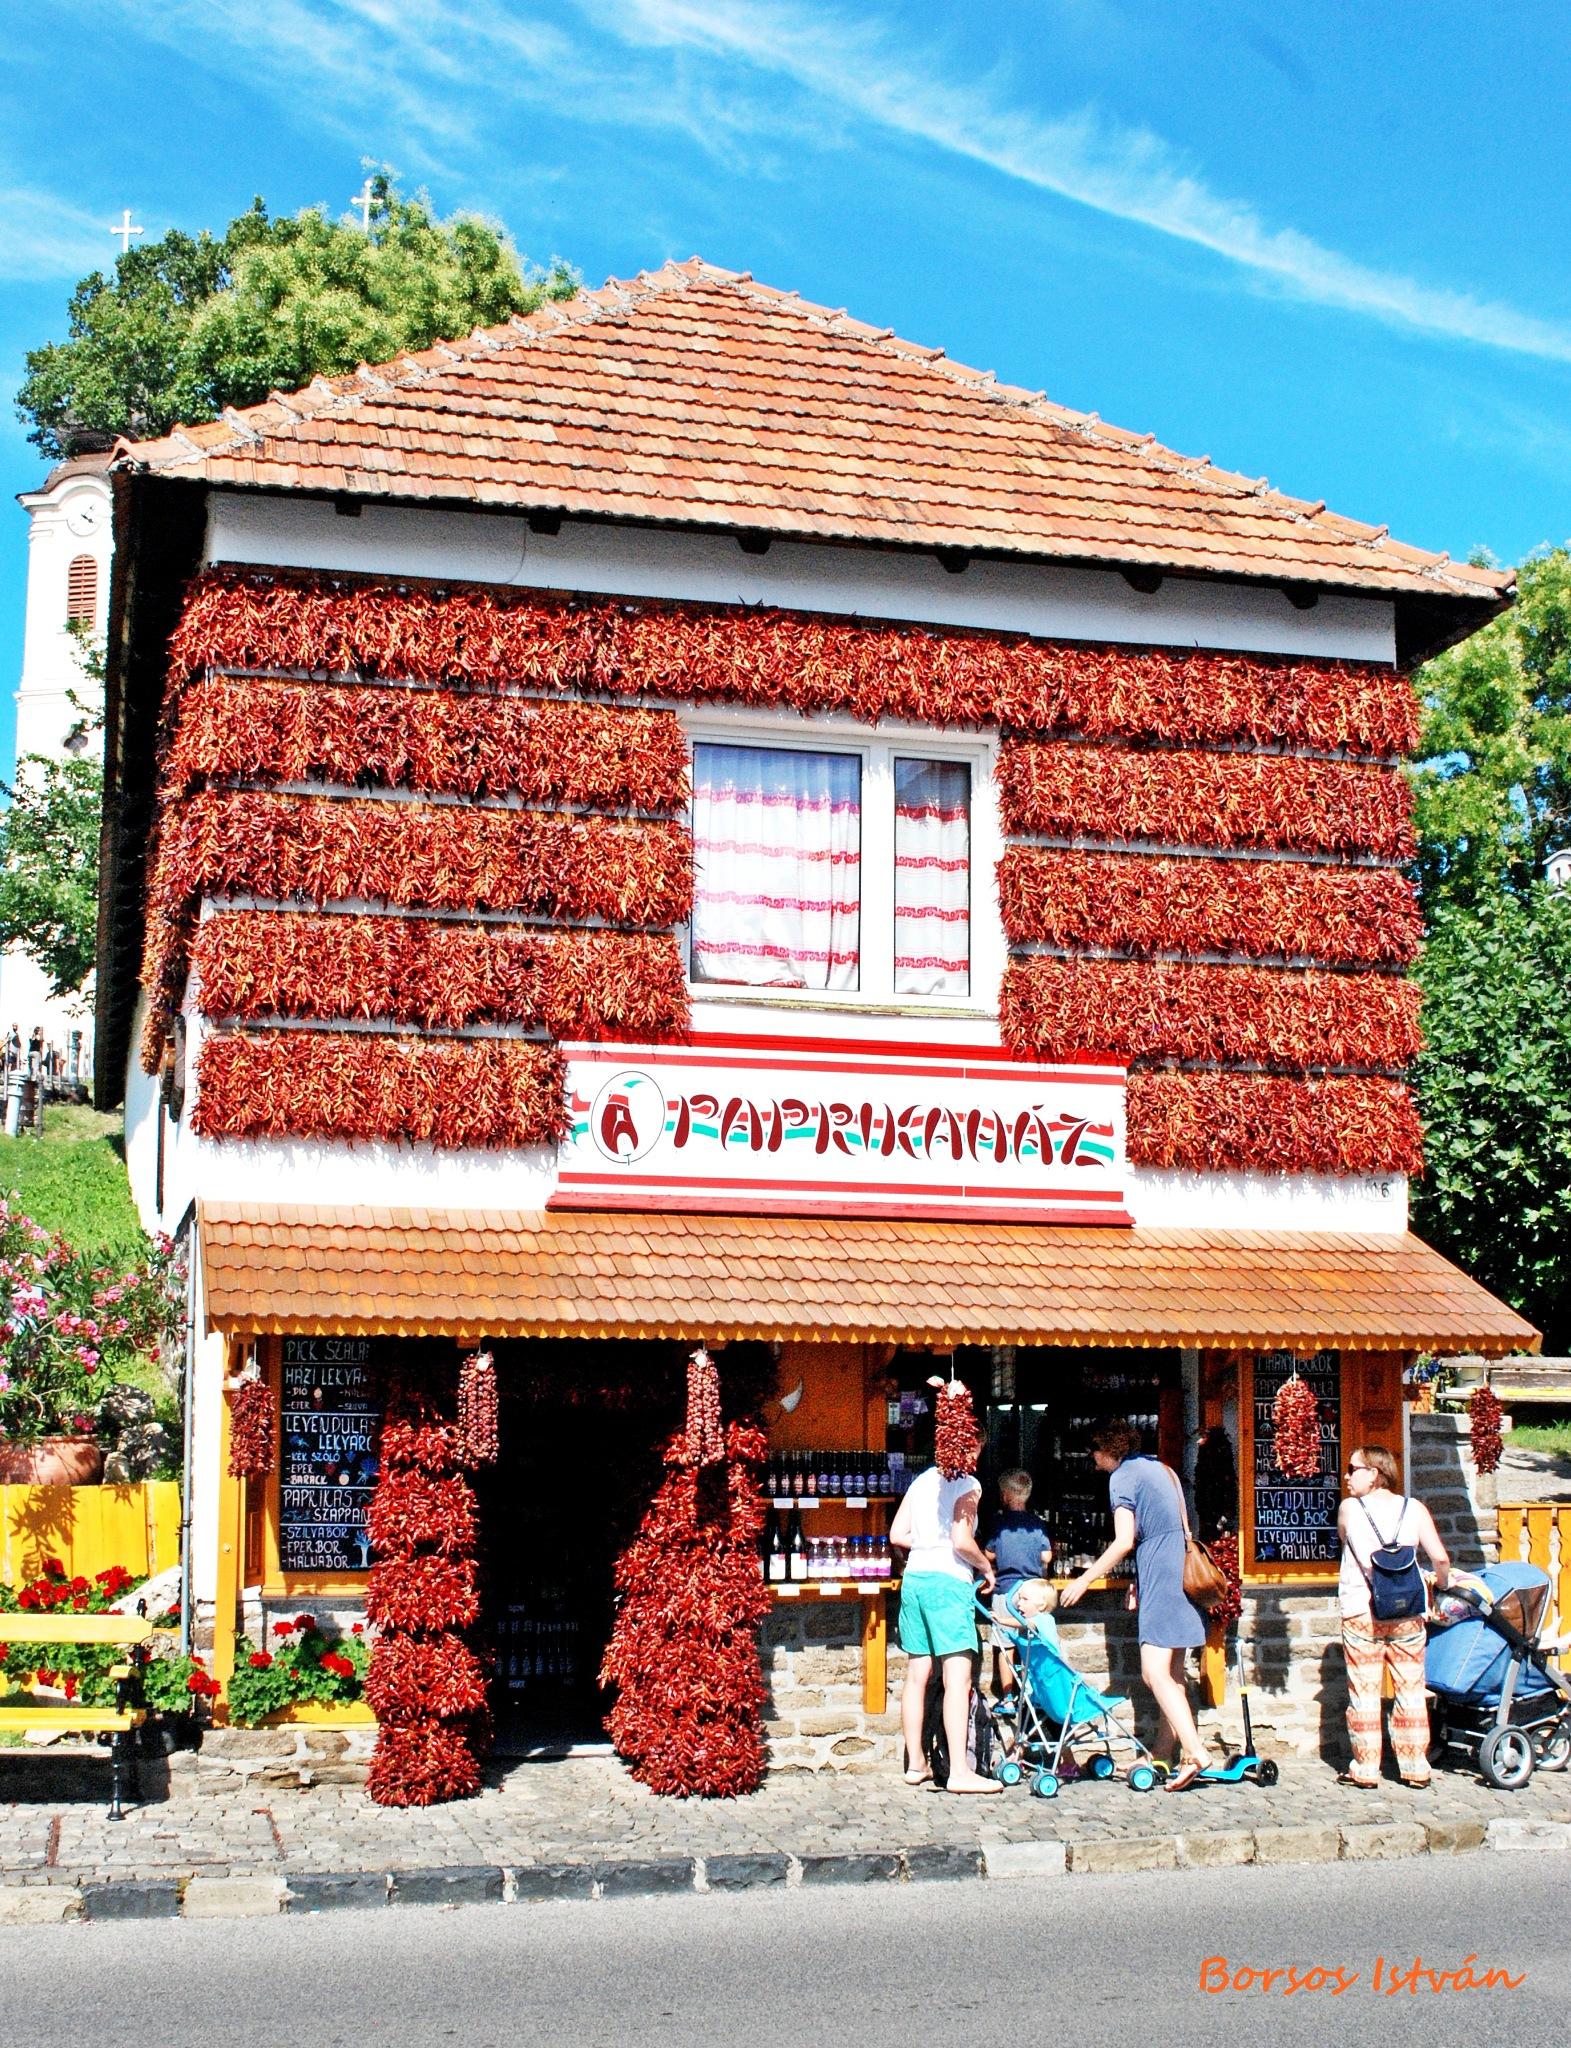 The pepper house by Borsos István